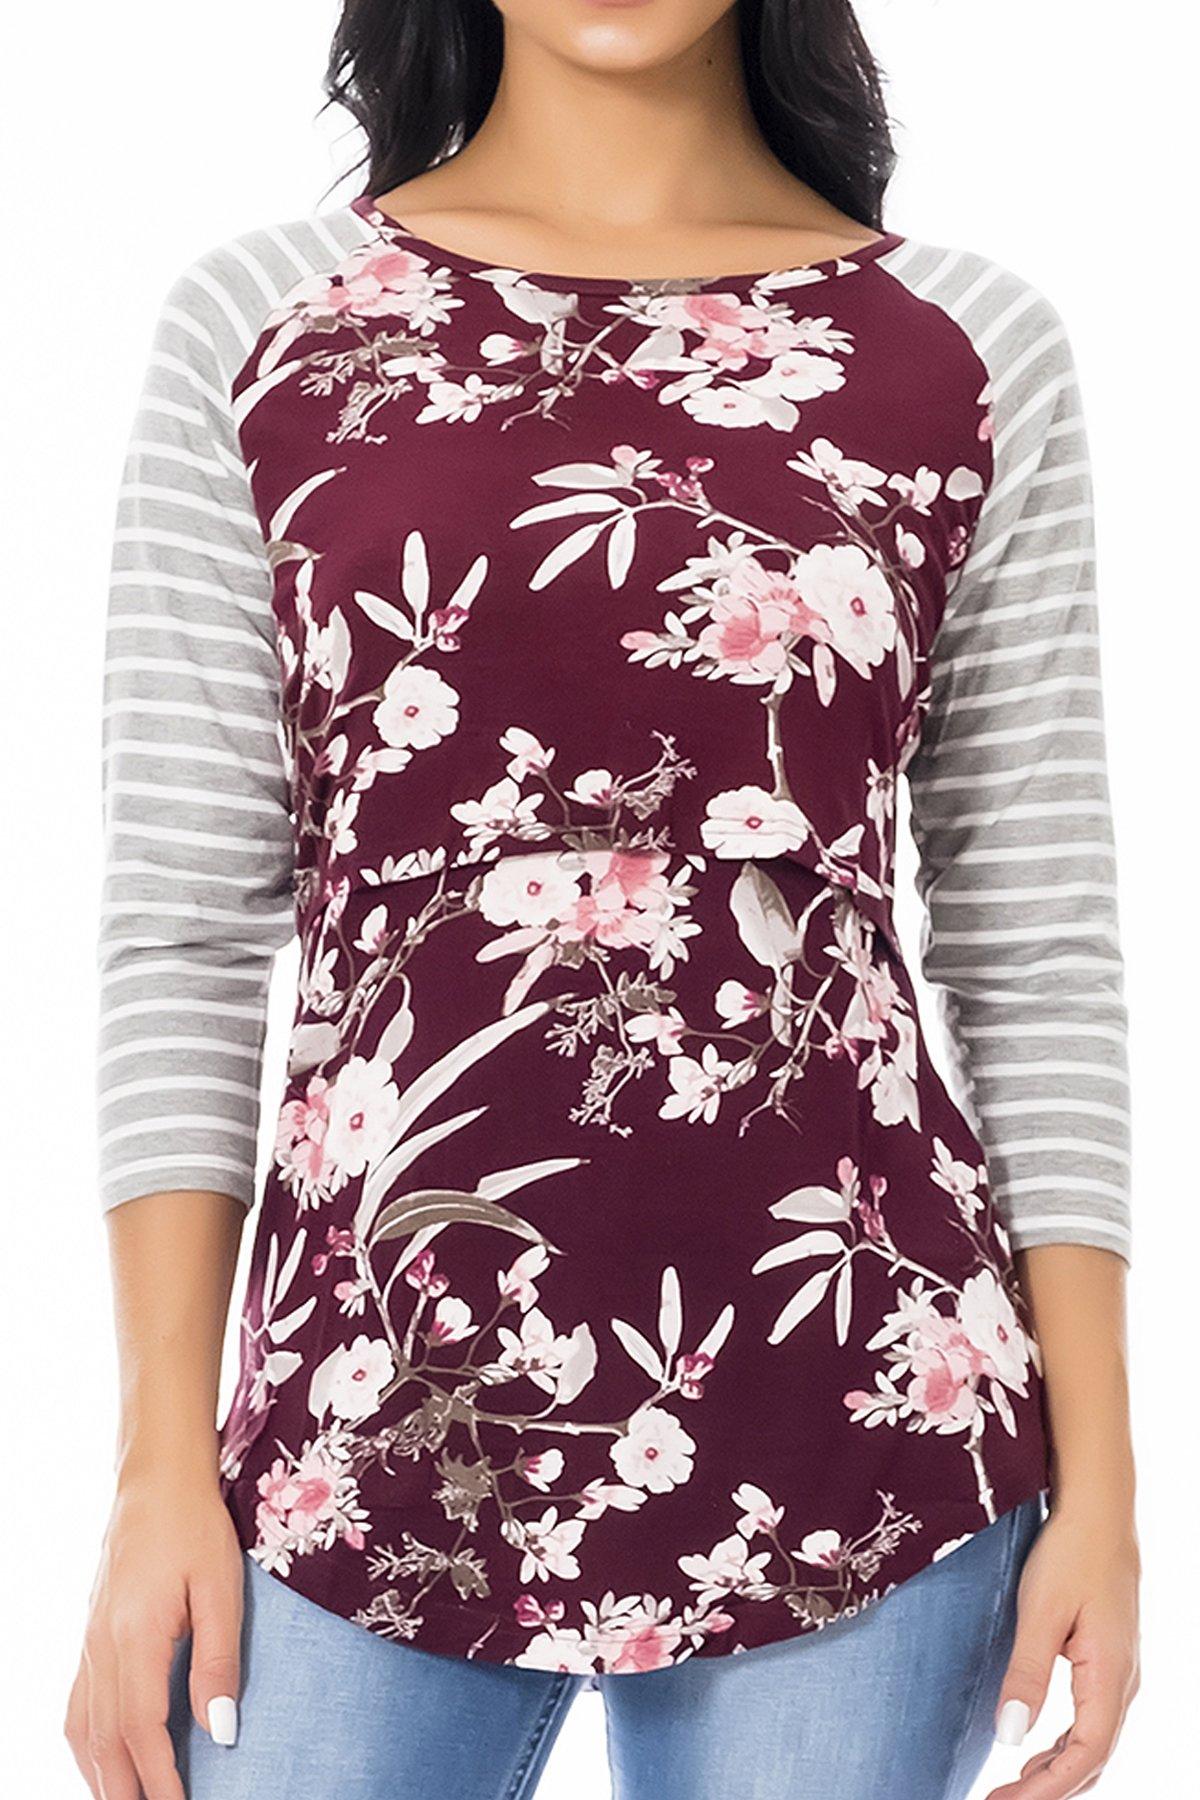 Smallshow Women's Nursing Clothes Striped Breastfeeding Tops X-Large SVP067